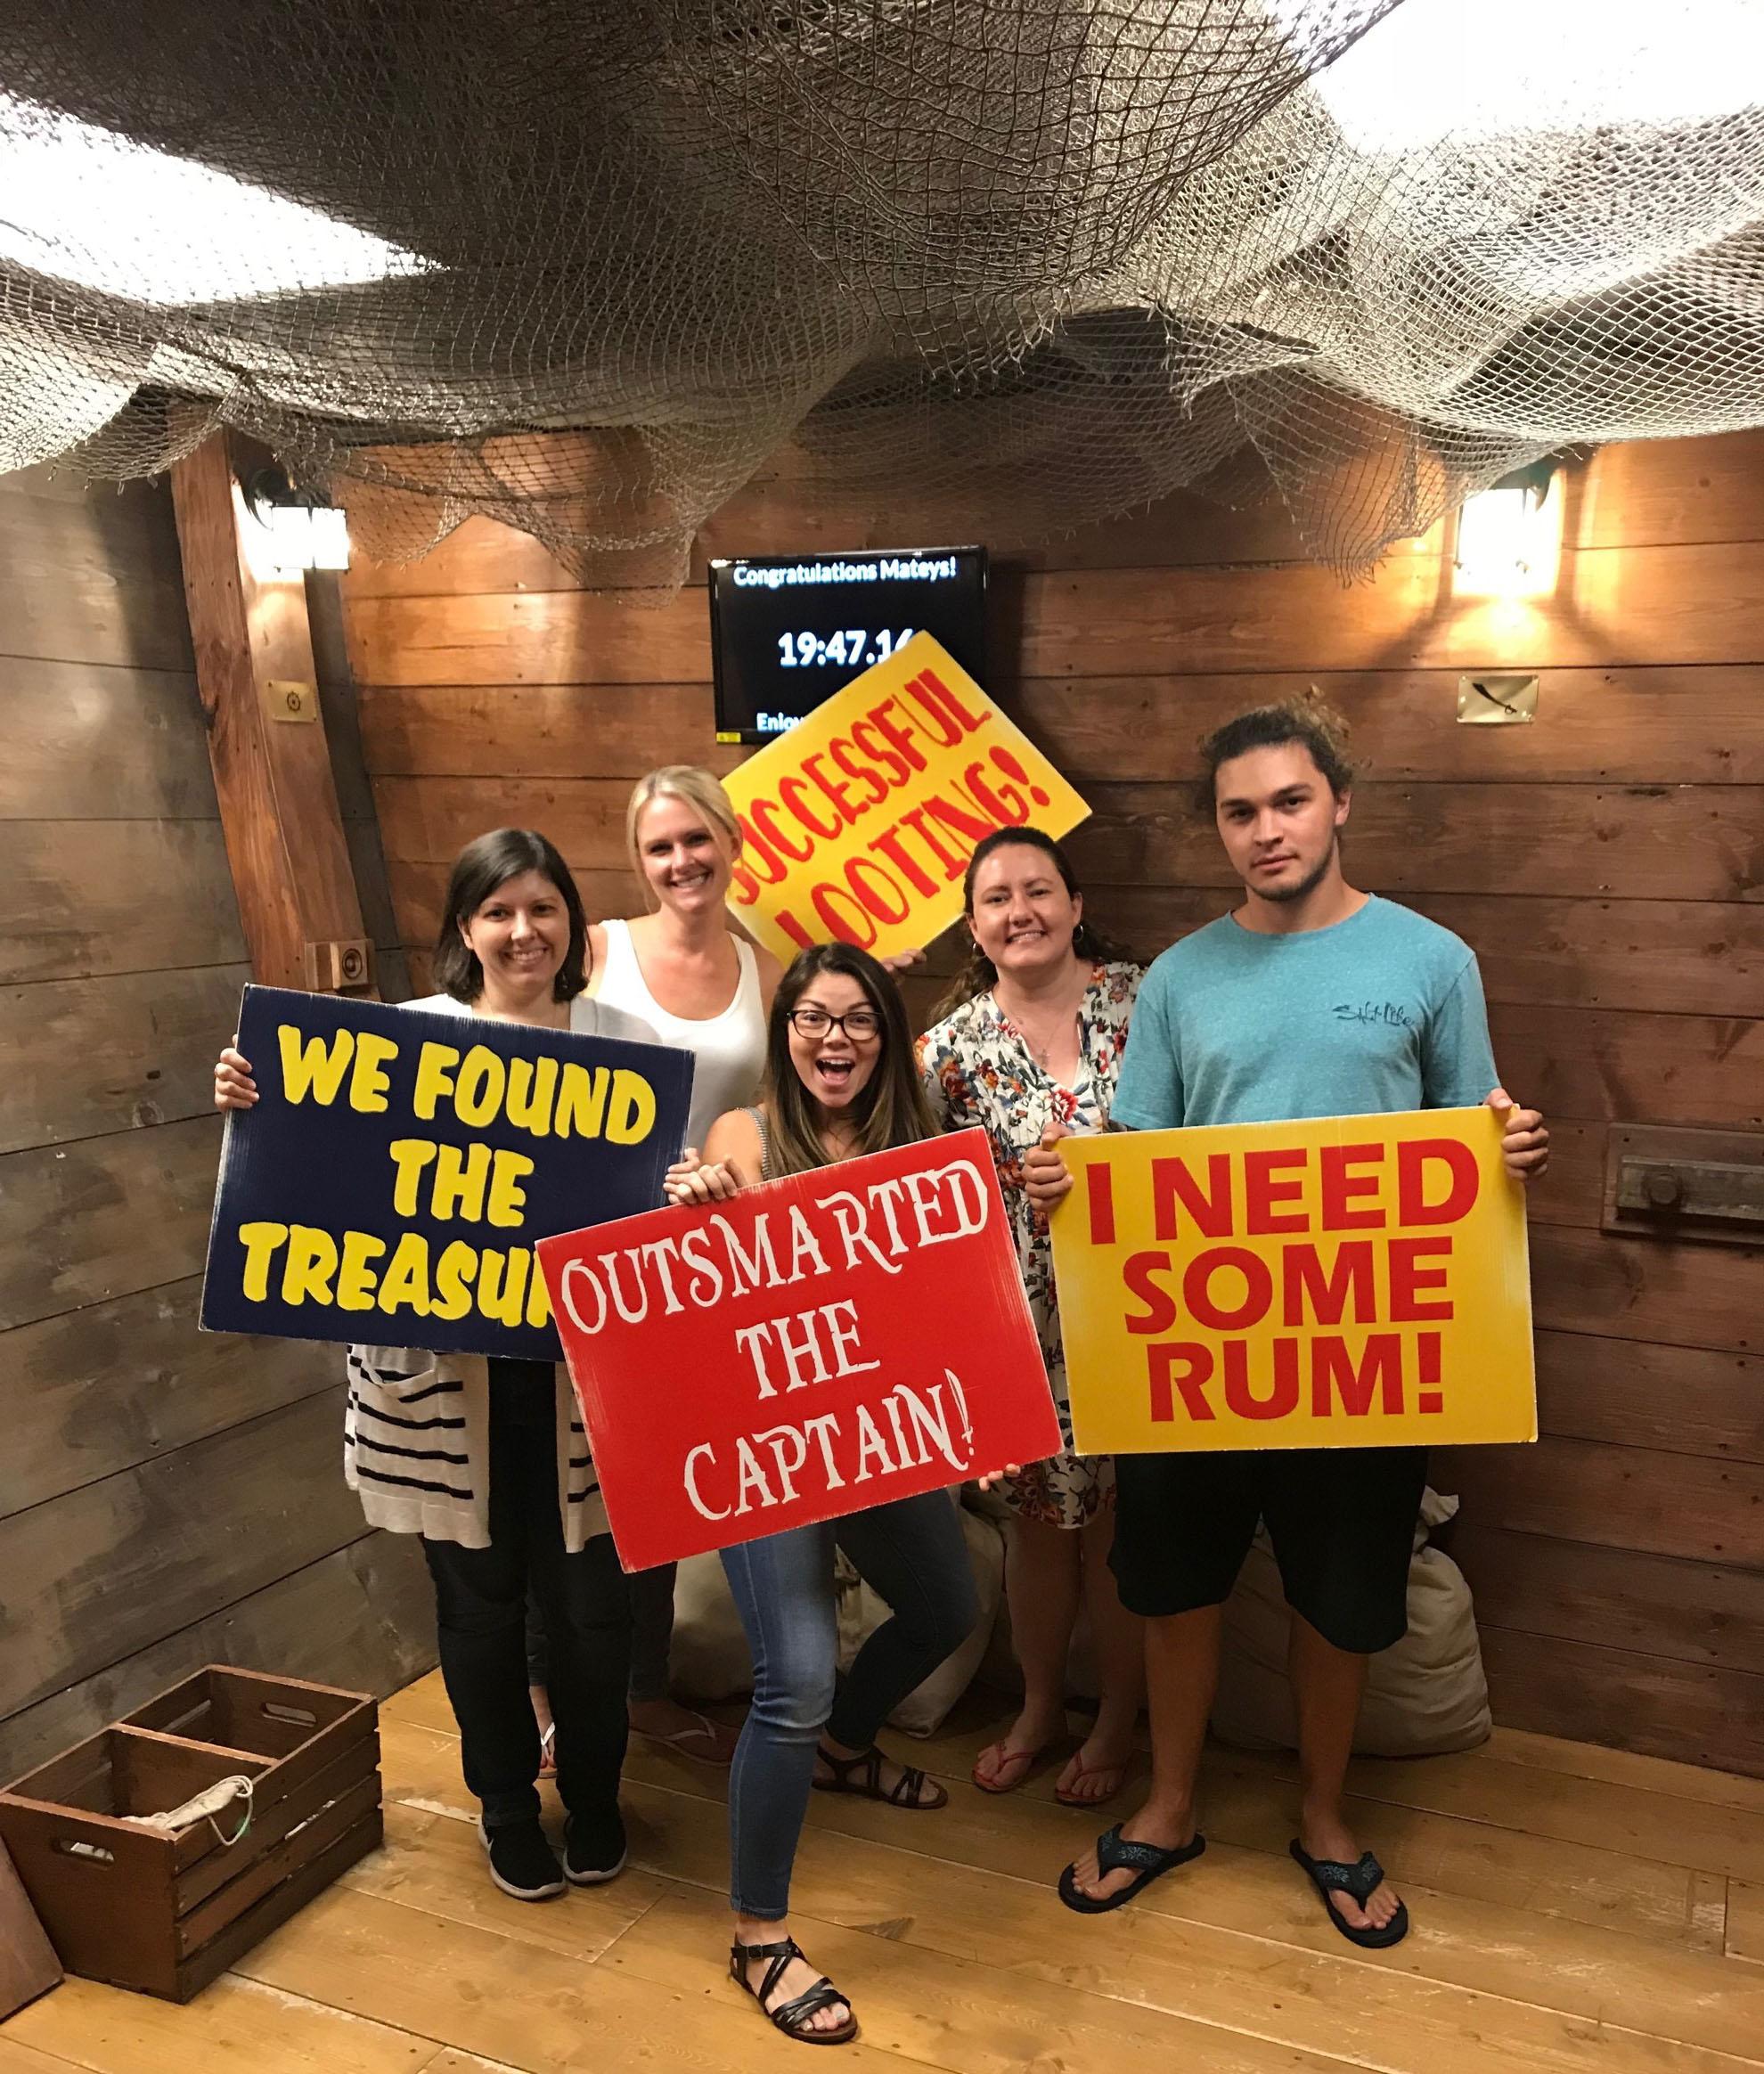 employees having fun at Escape Room Adventures